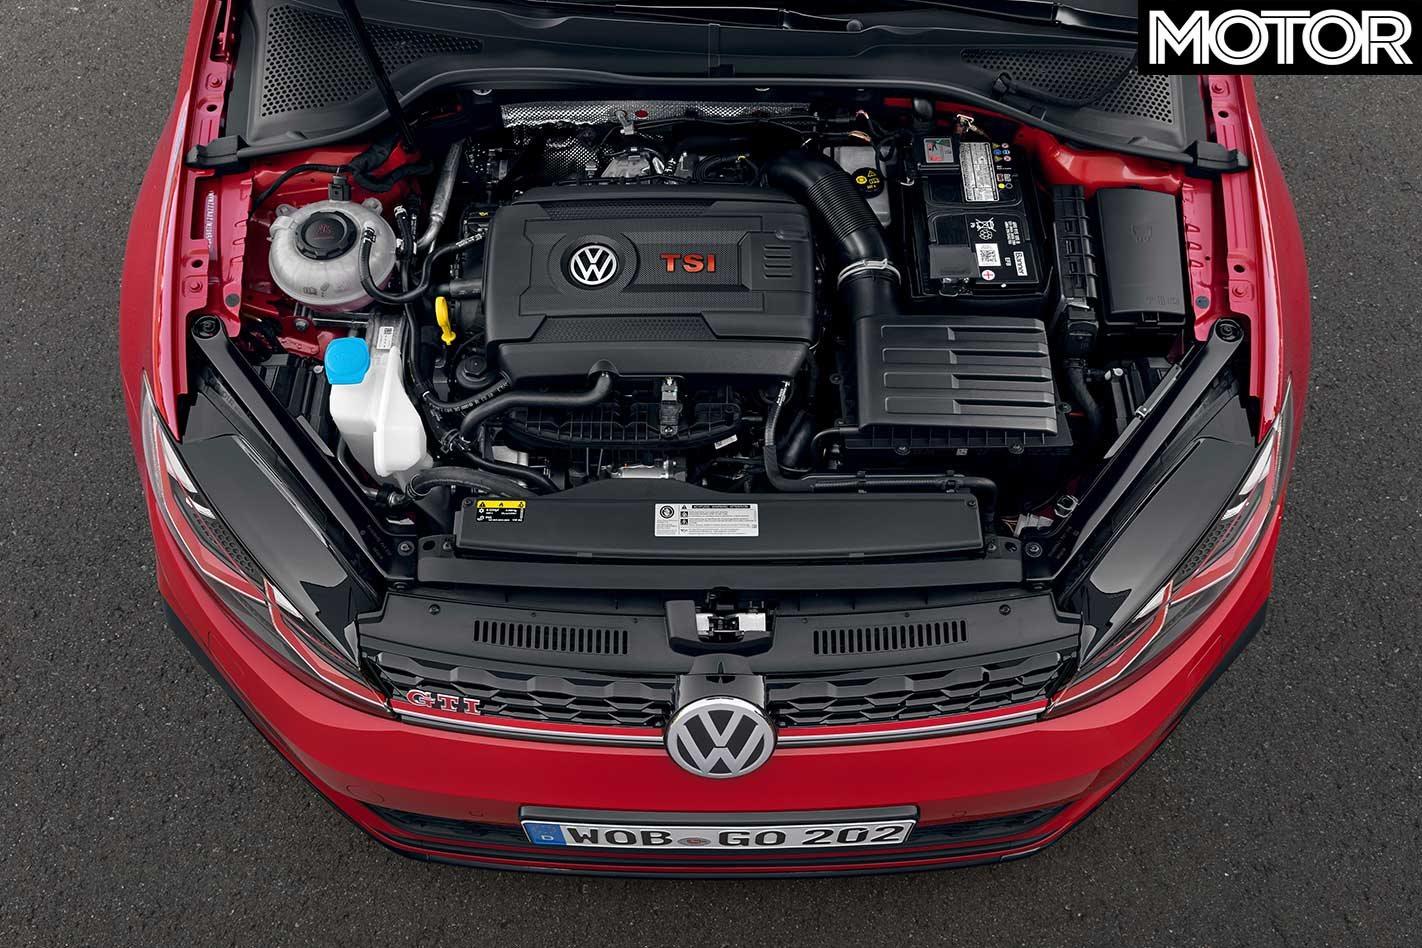 2019 Volkswagen Golf GTI TCR review | MOTOR Magazine